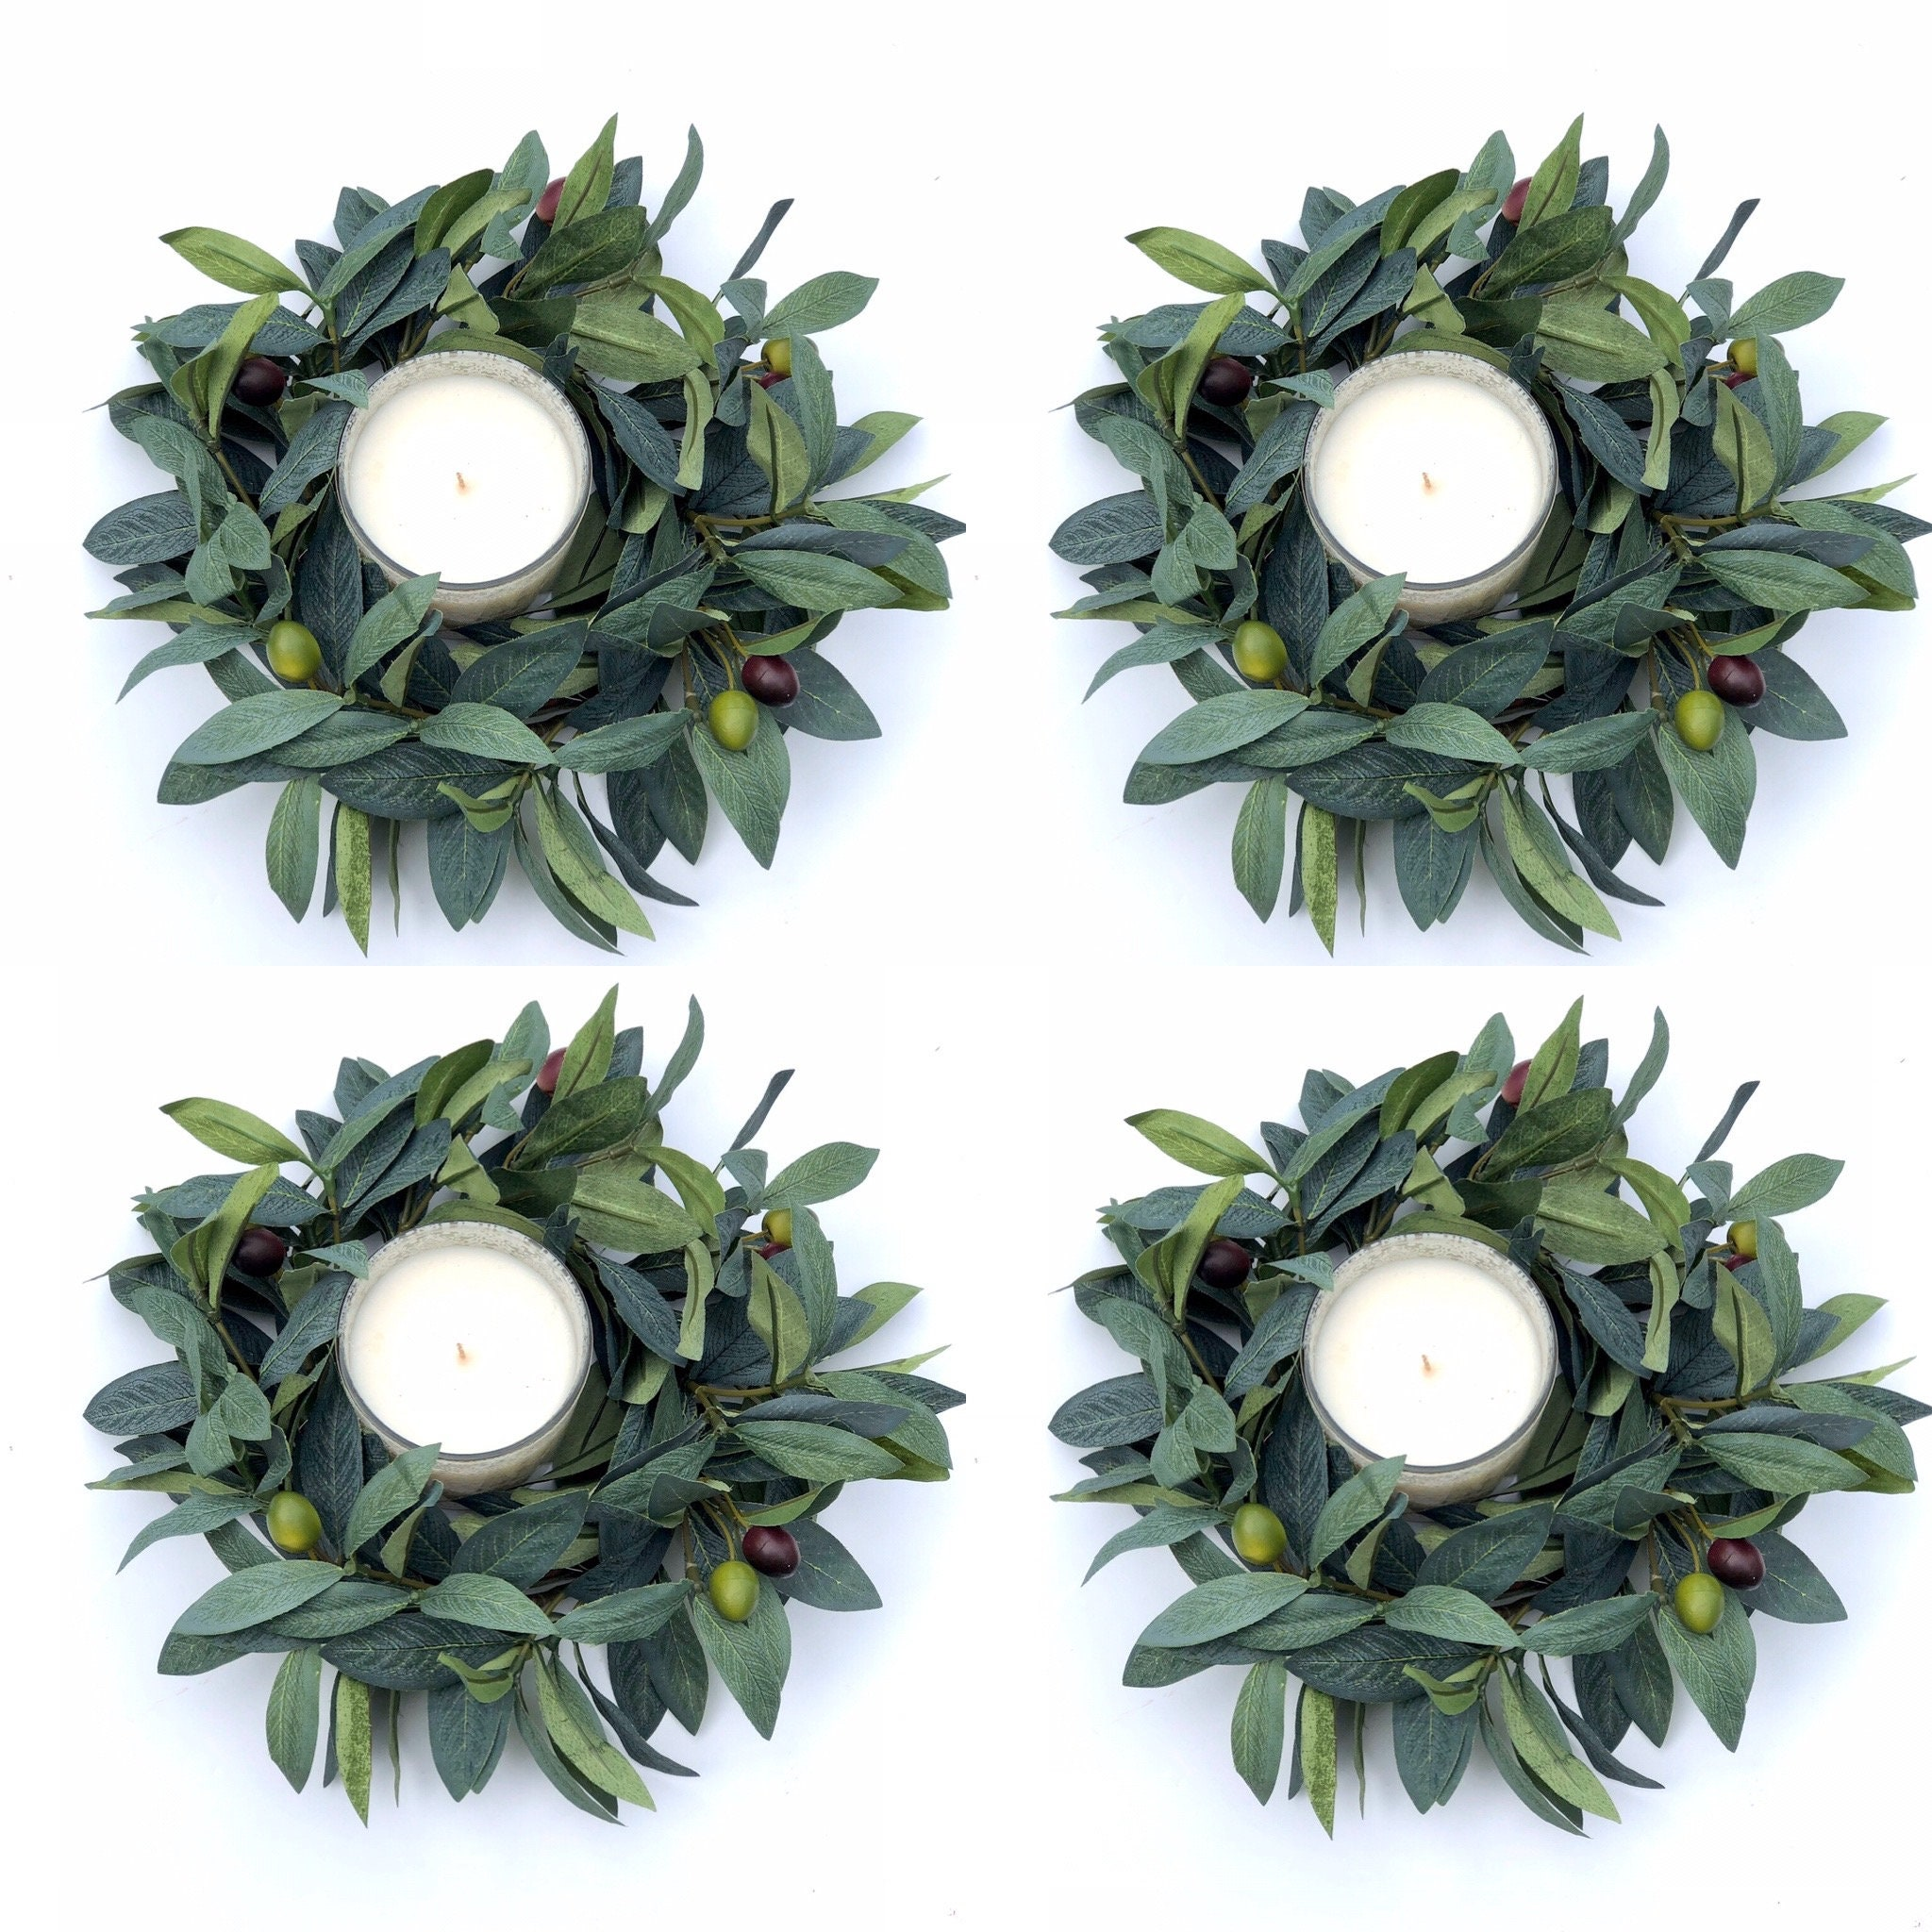 Candle Ring Eucalyptus Wreath Greenery Wreath Small Wreath Lamb S Ear Wreath Wedding Decor Table Decor Farmhouse Centerpiece